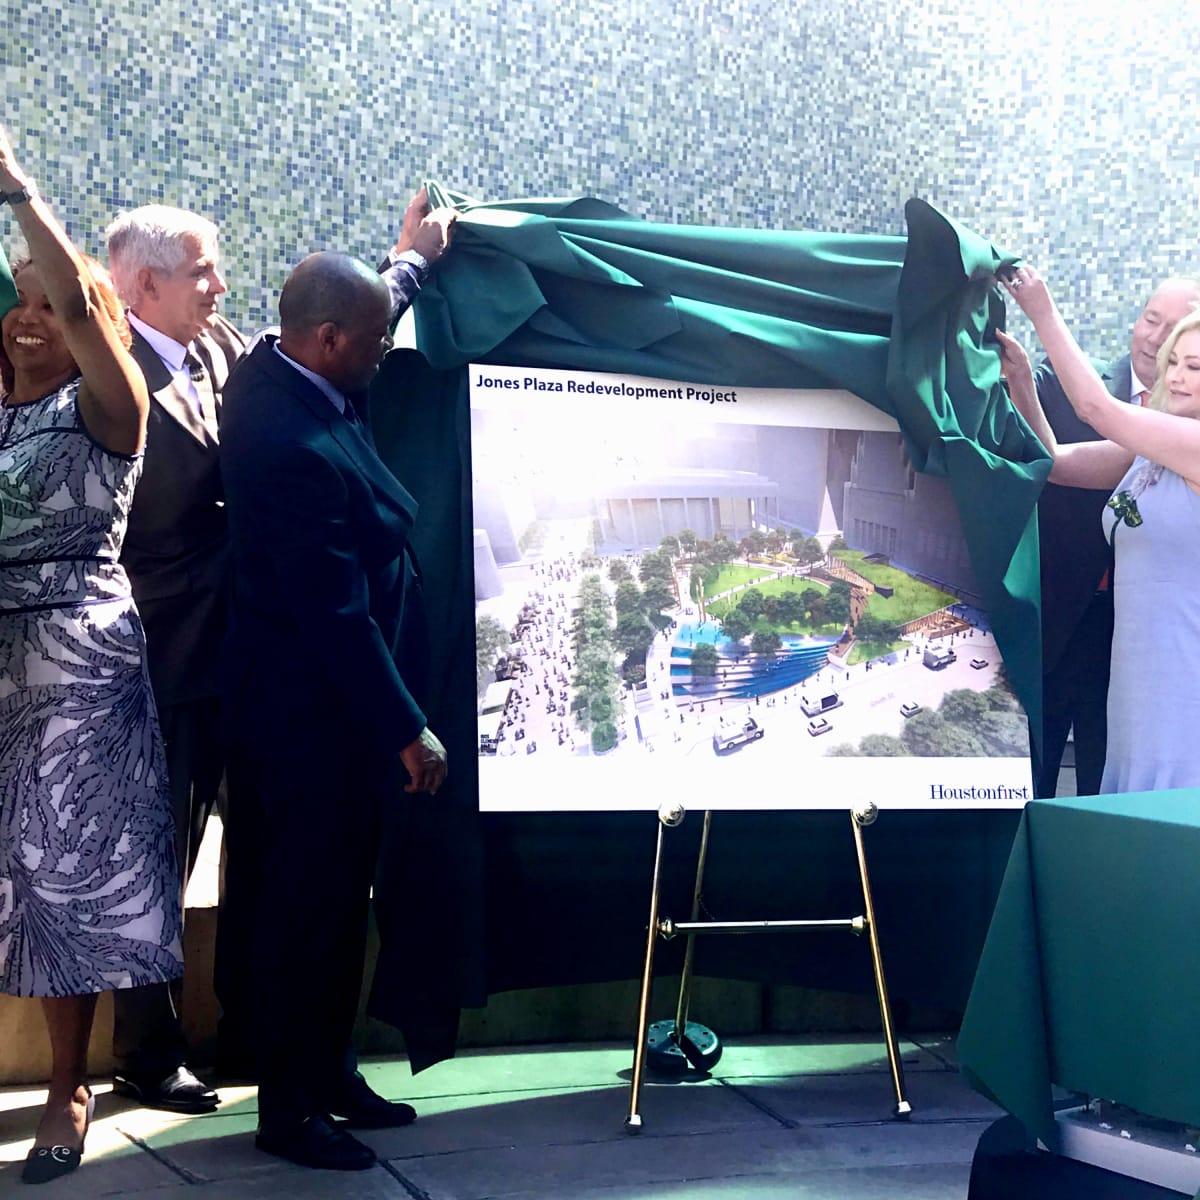 Jones Plaza redevelopment Mayor Turner Jim Crane Whitney Crane unveil